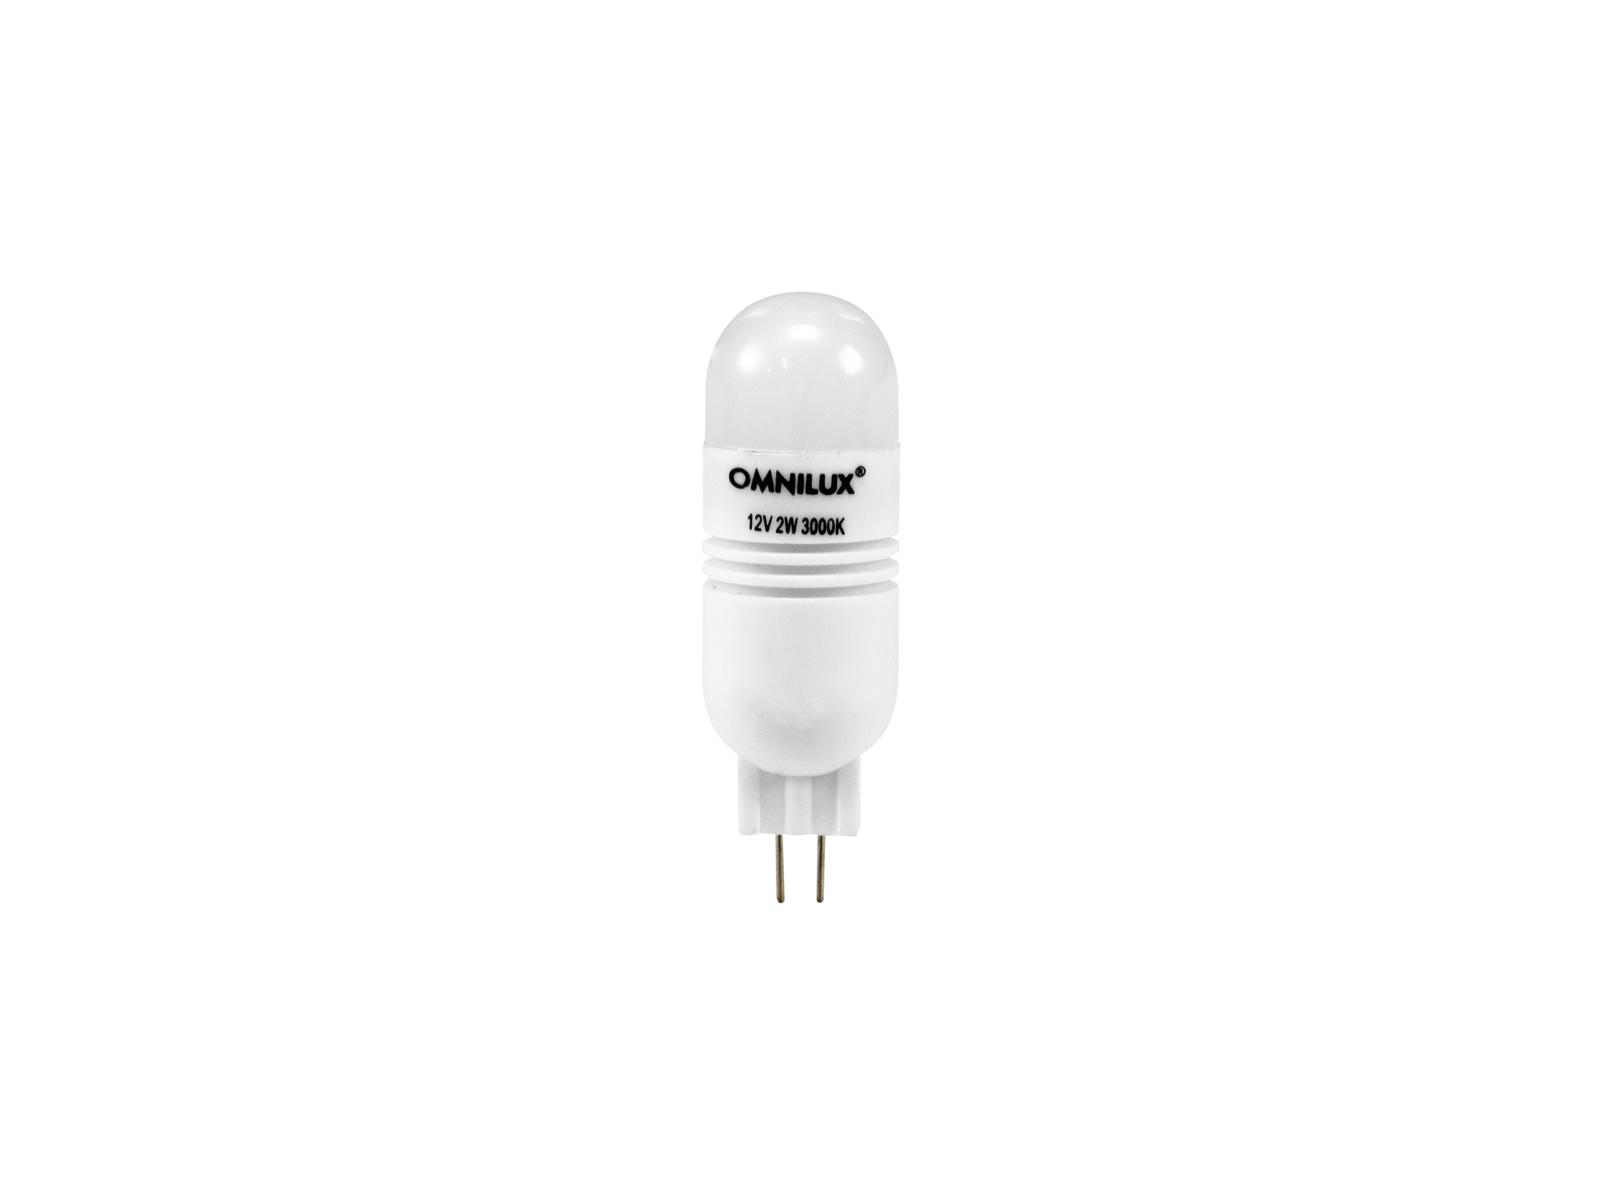 230V/2,5W G9 3000K Omnilux LED